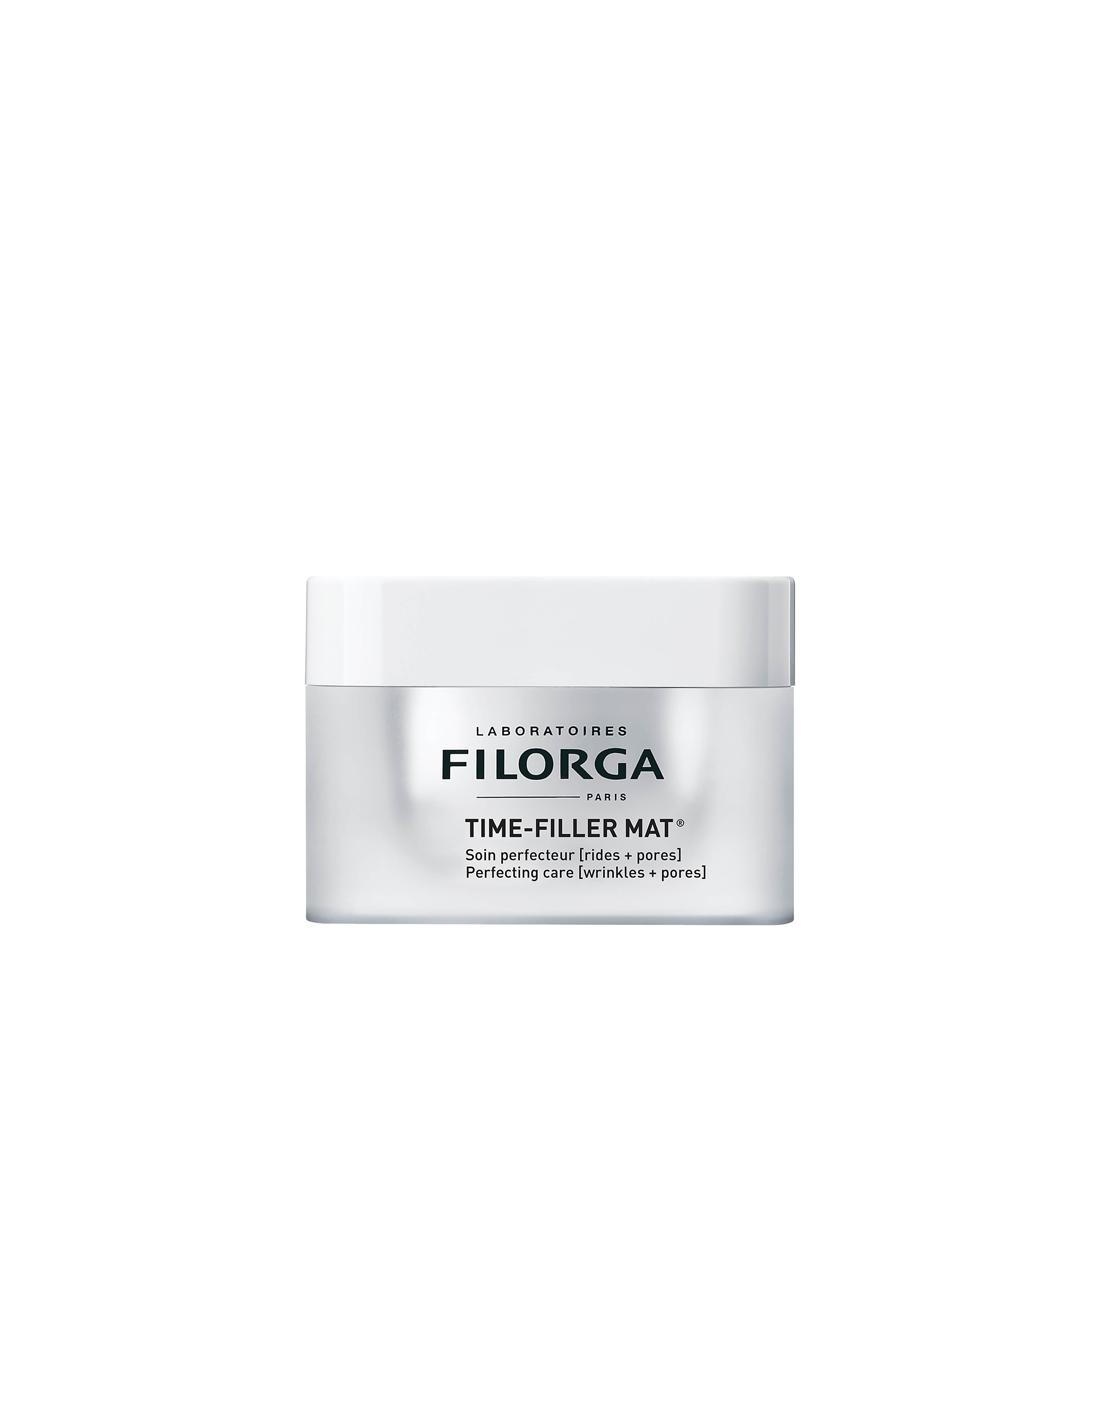 Filorga Time-Filler Mat Crema Viso Antirughe + Pori 50 ml